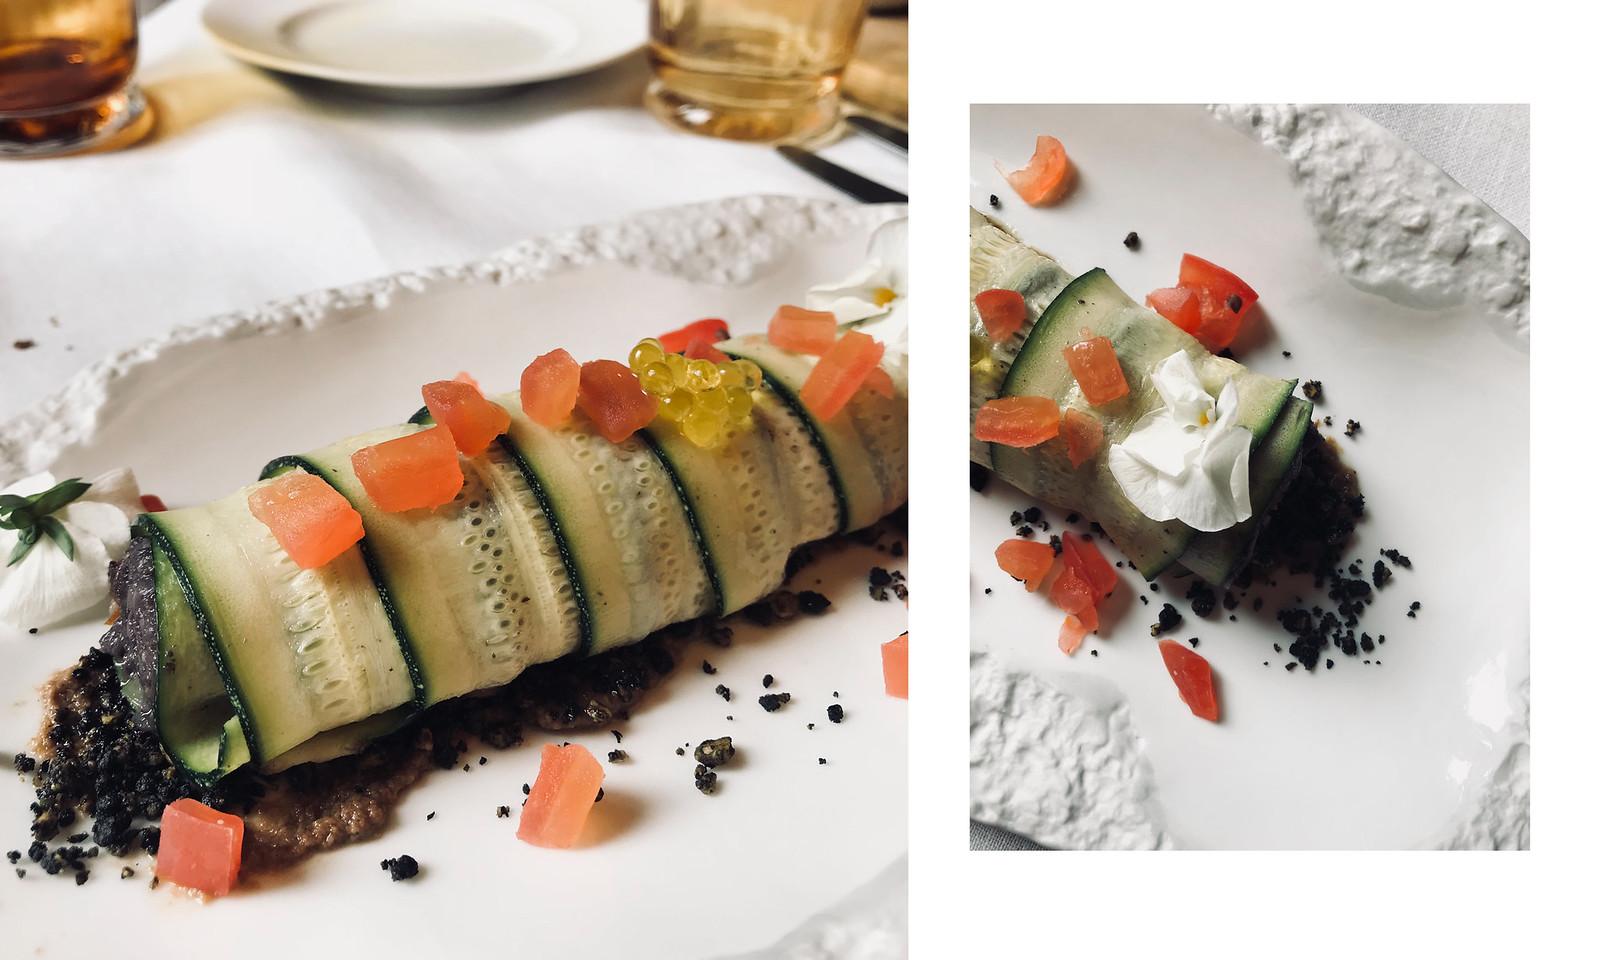 06_cotton_house_barcelona_hotel_restaurante_lujo_influencer_theguestgirl_laura_santolaria_comer_bien_en_barcelona